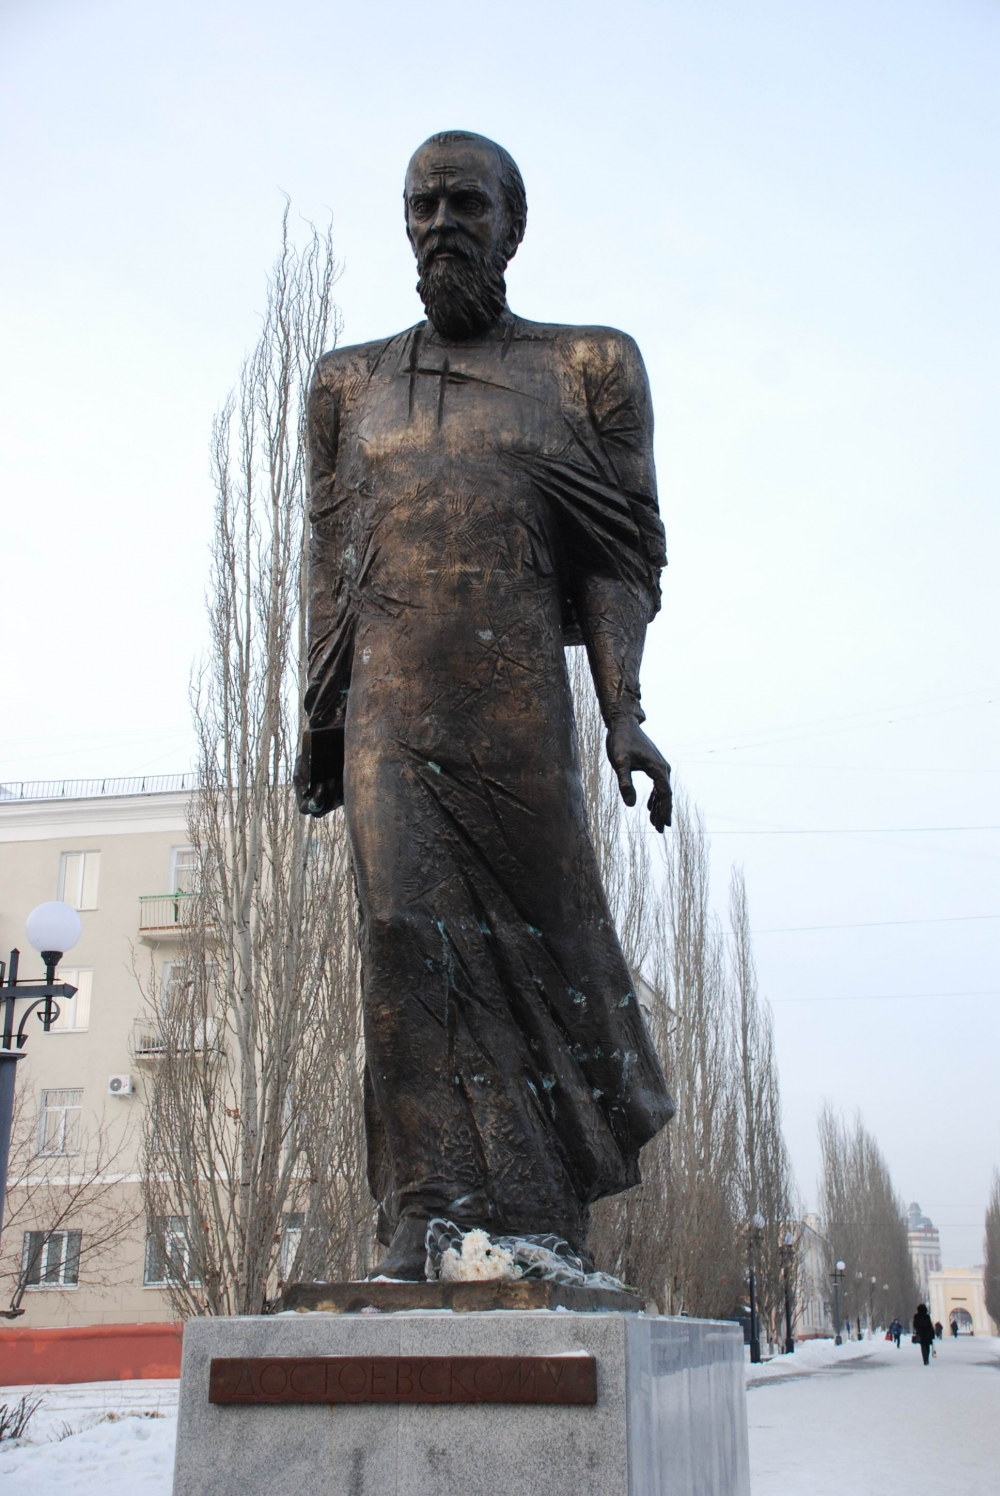 Фёдор Михайлович Достоевский скульптора Голованцева.